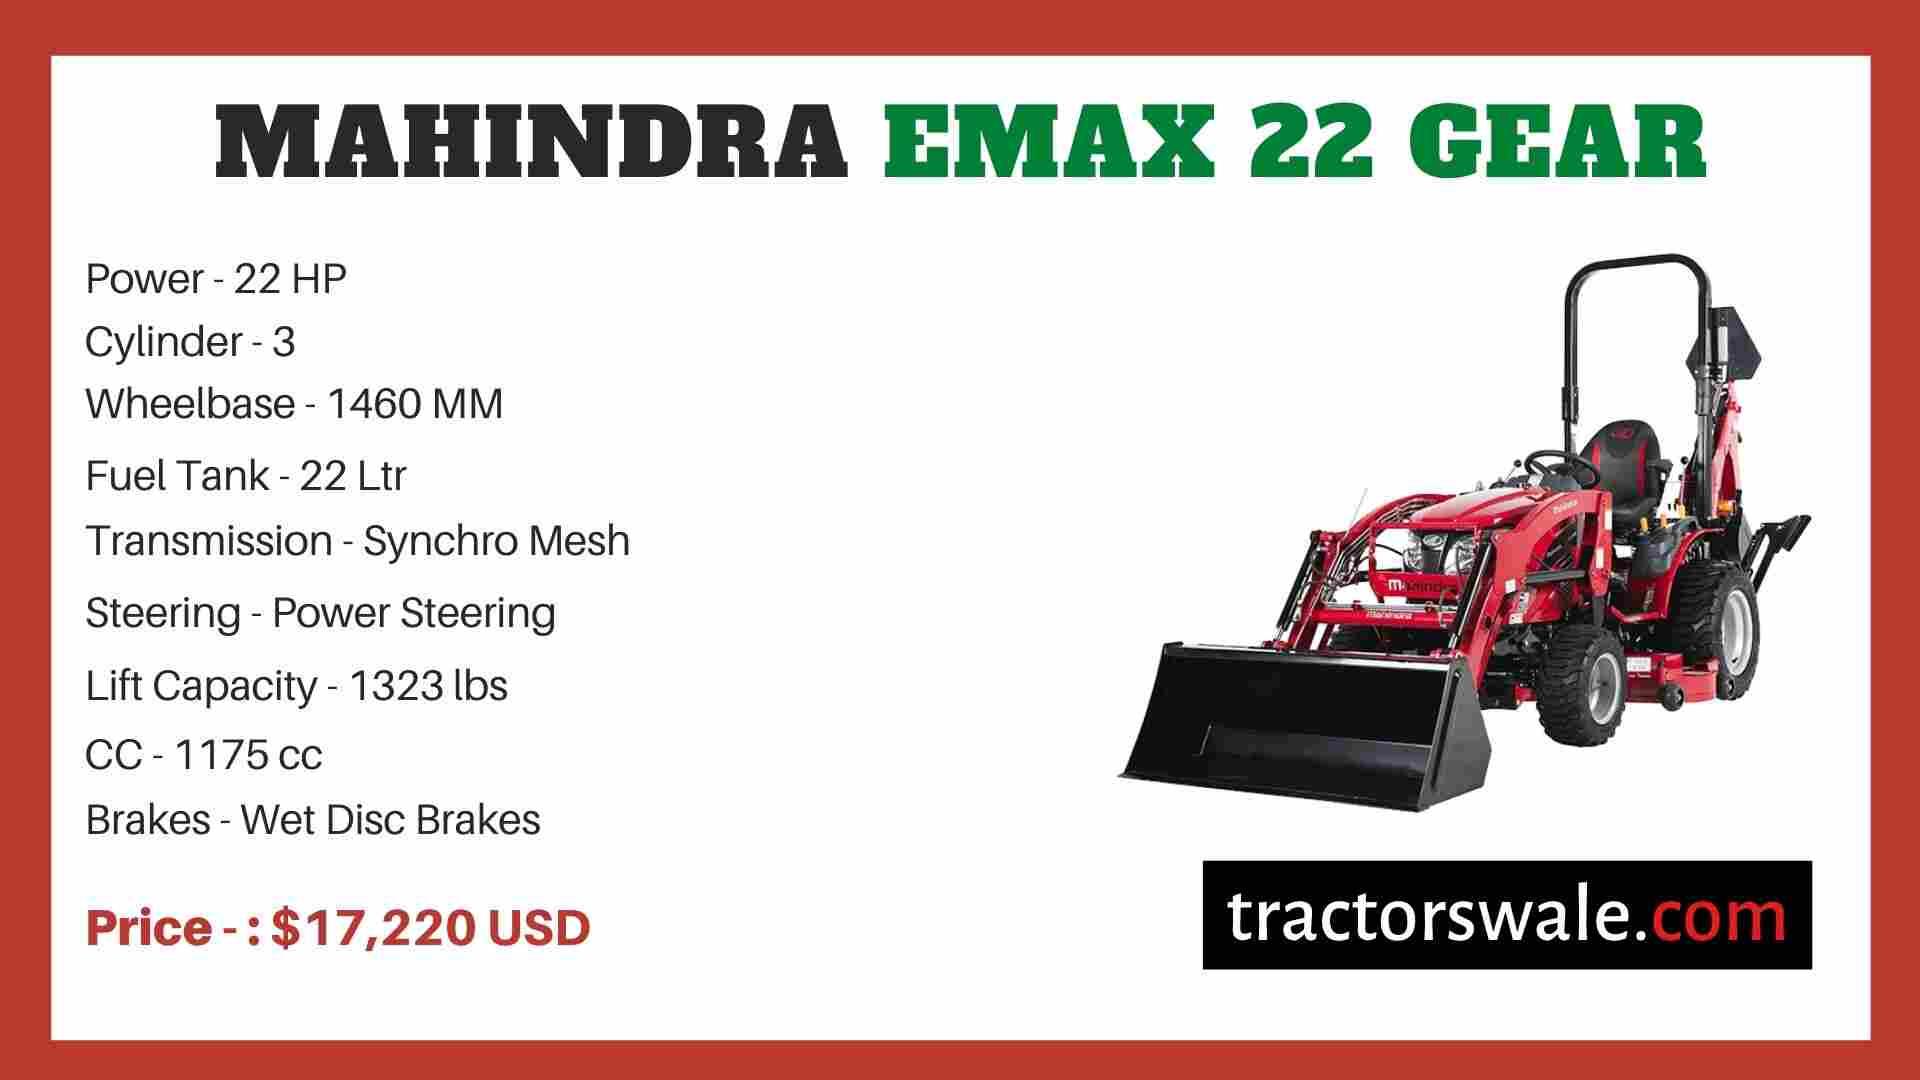 Mahindra Emax 22 Gear price